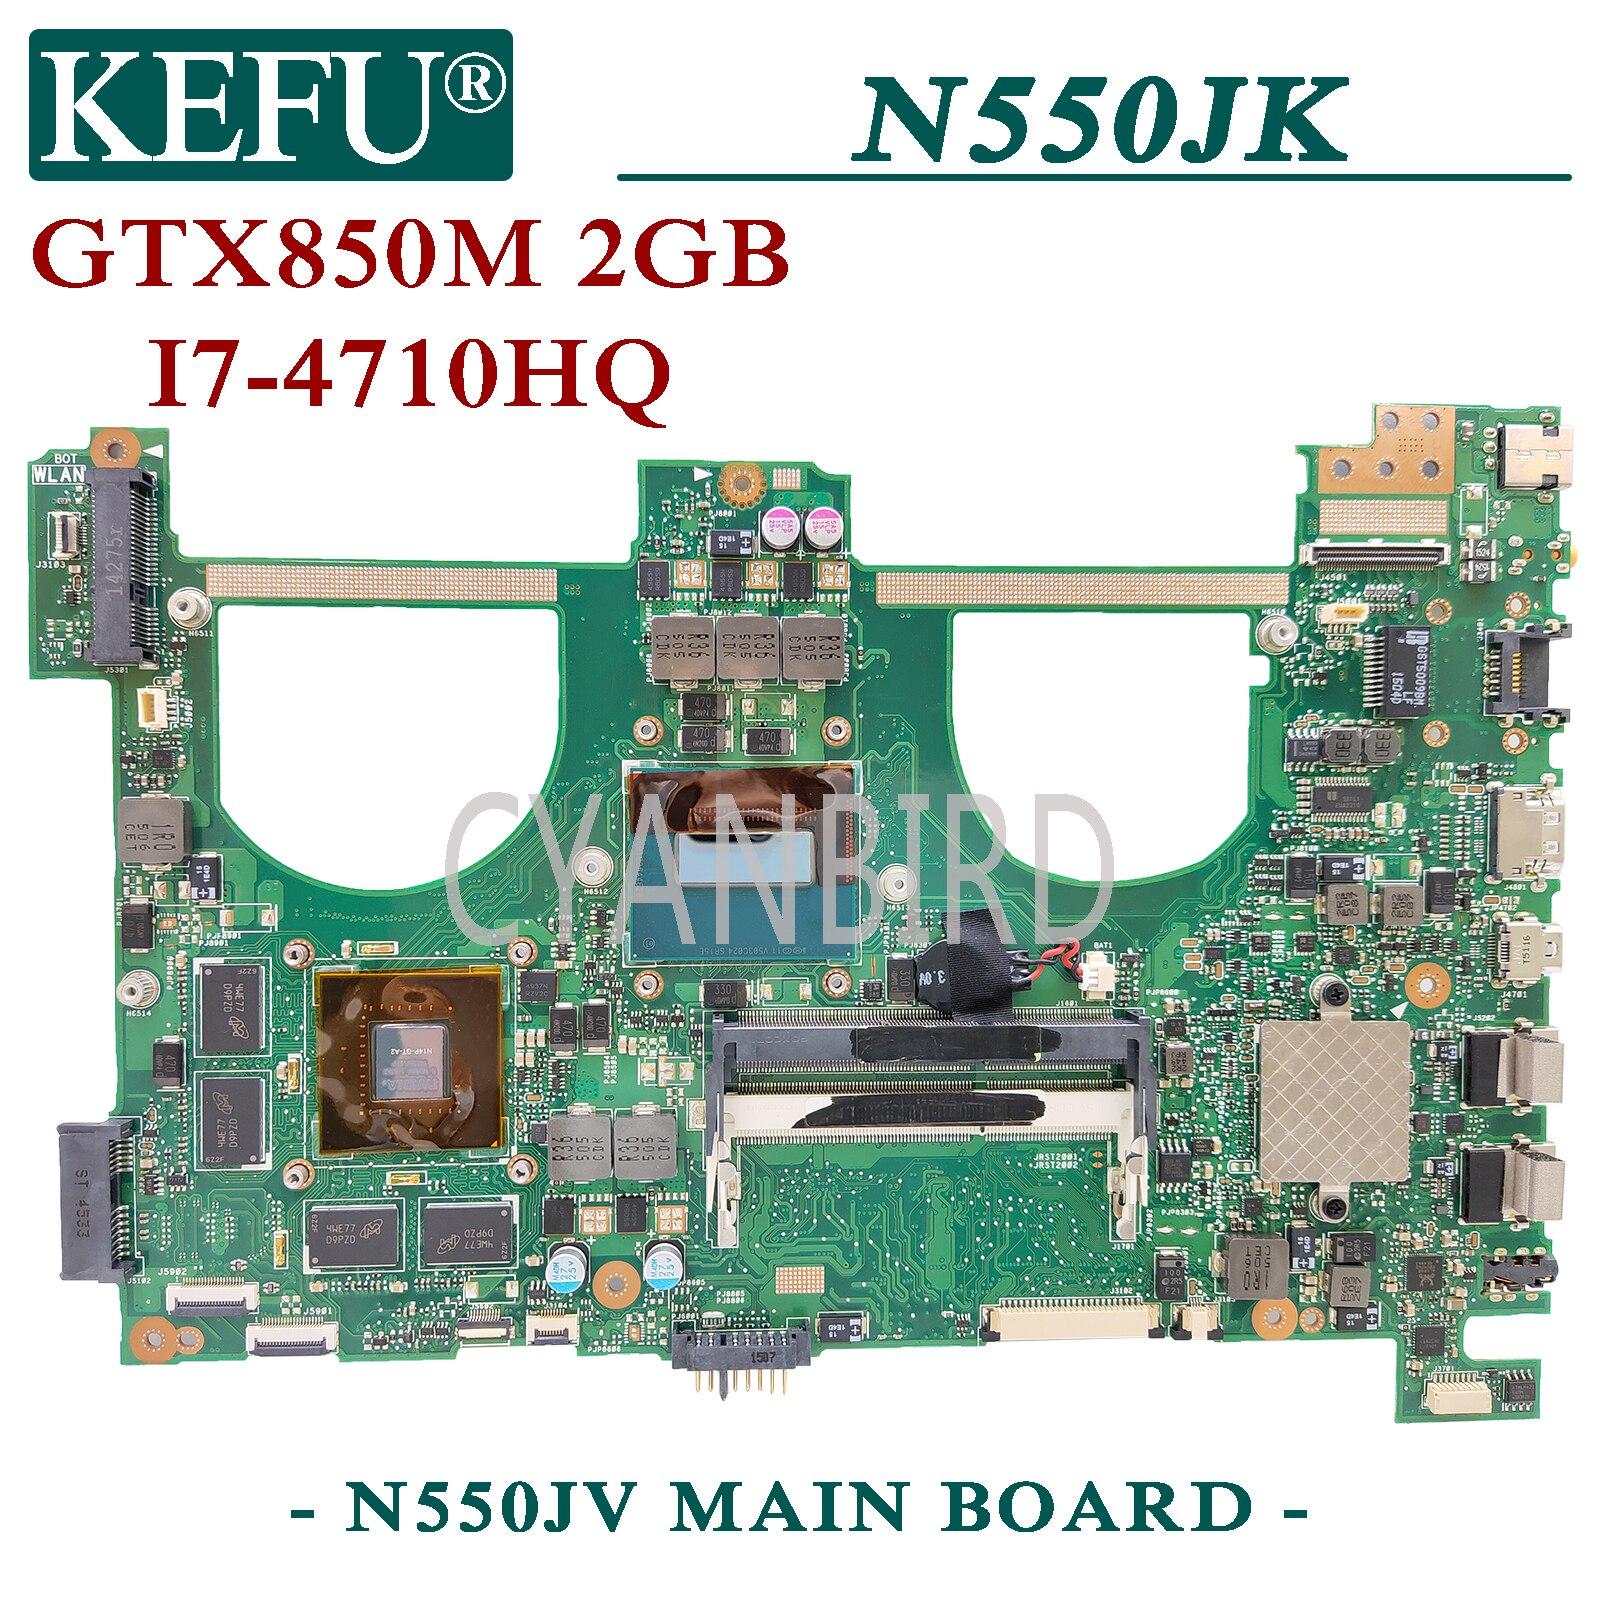 KEFU N550JV الأصلي اللوحة الرئيسية ل ASUS N550JK N550JX N550J G550J مع I7-4710HQ اللوحة الأم GTX850M-2GB